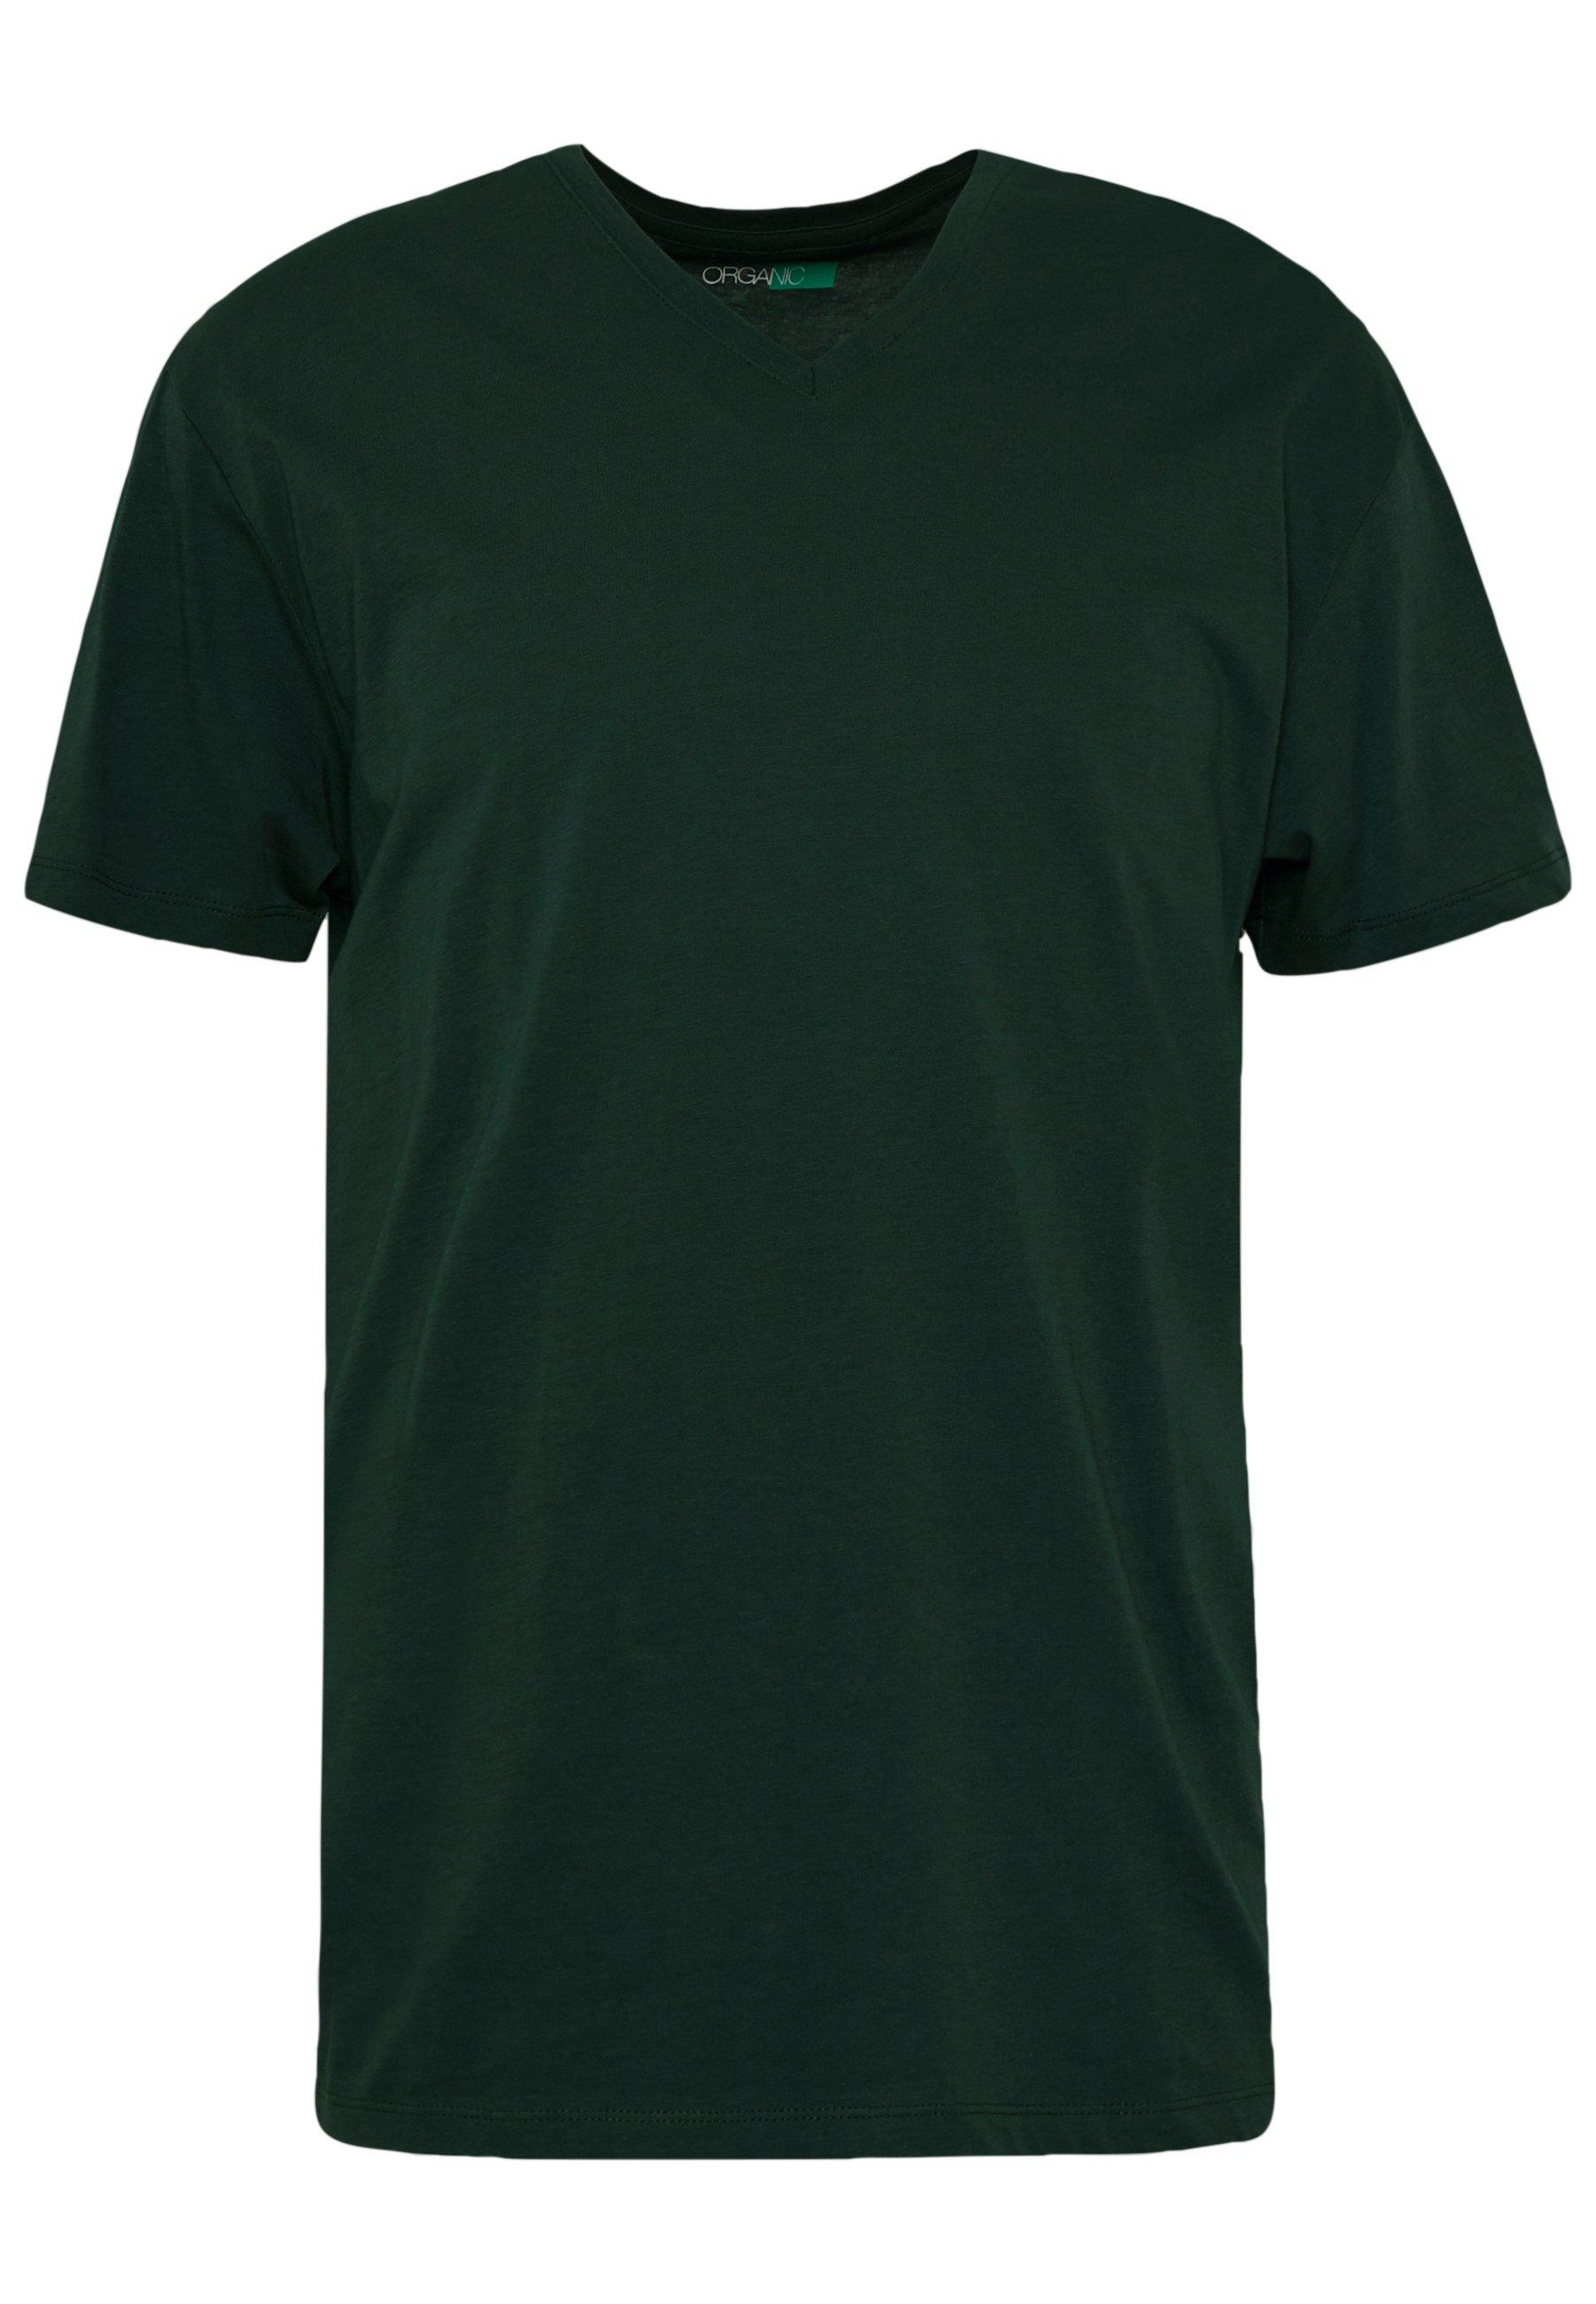 Esprit T-shirt basic - teal blue